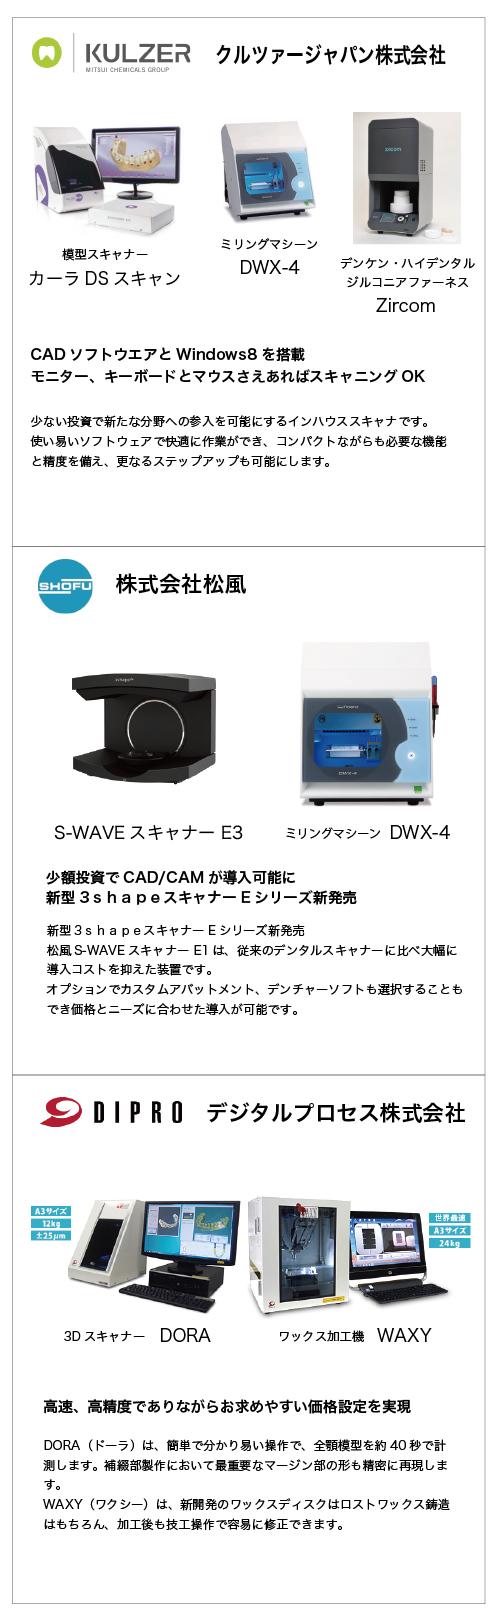 180201kanazawa_cadcam03